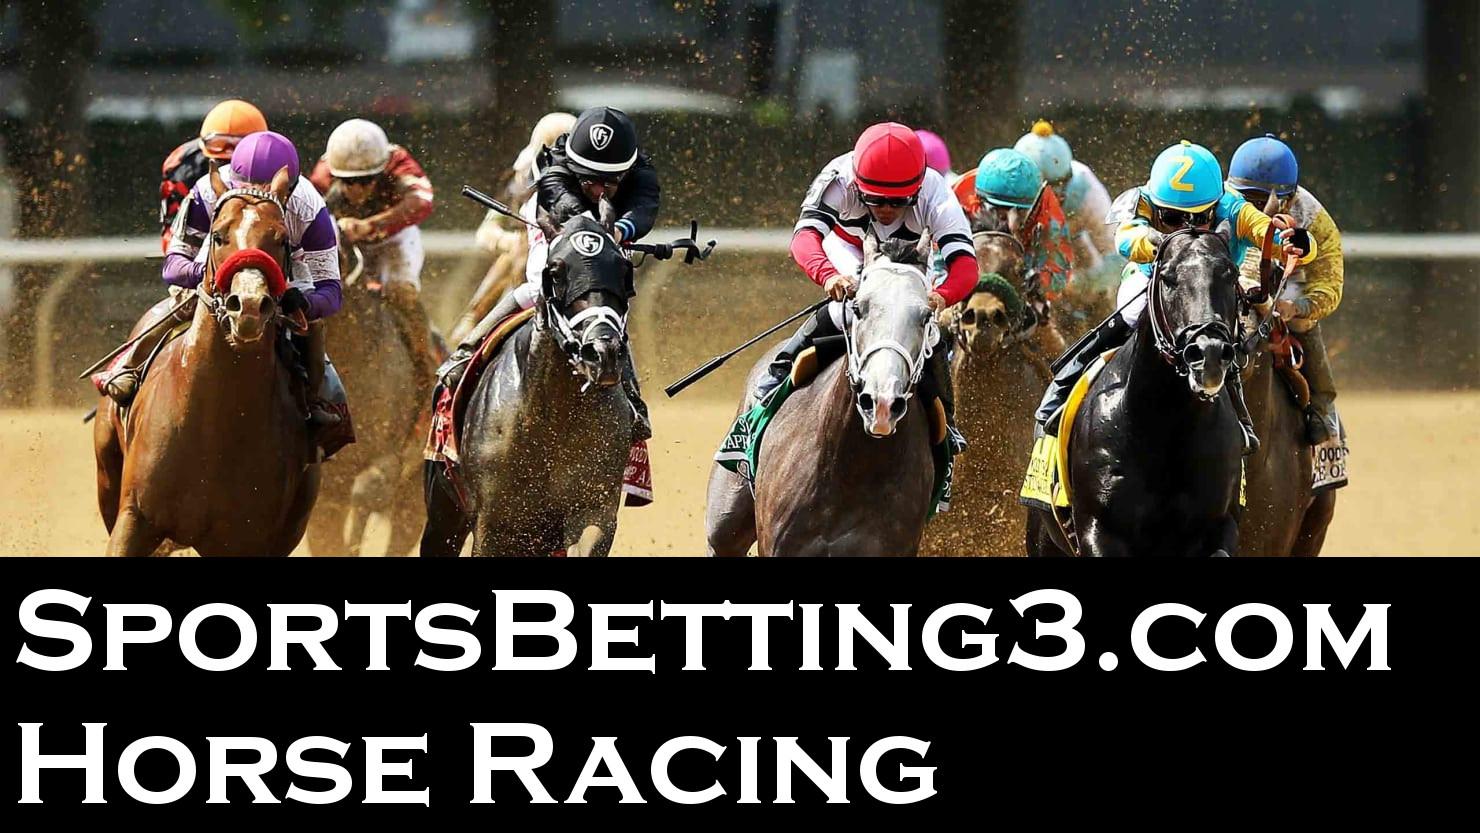 SportsBetting3.com Horse Racing